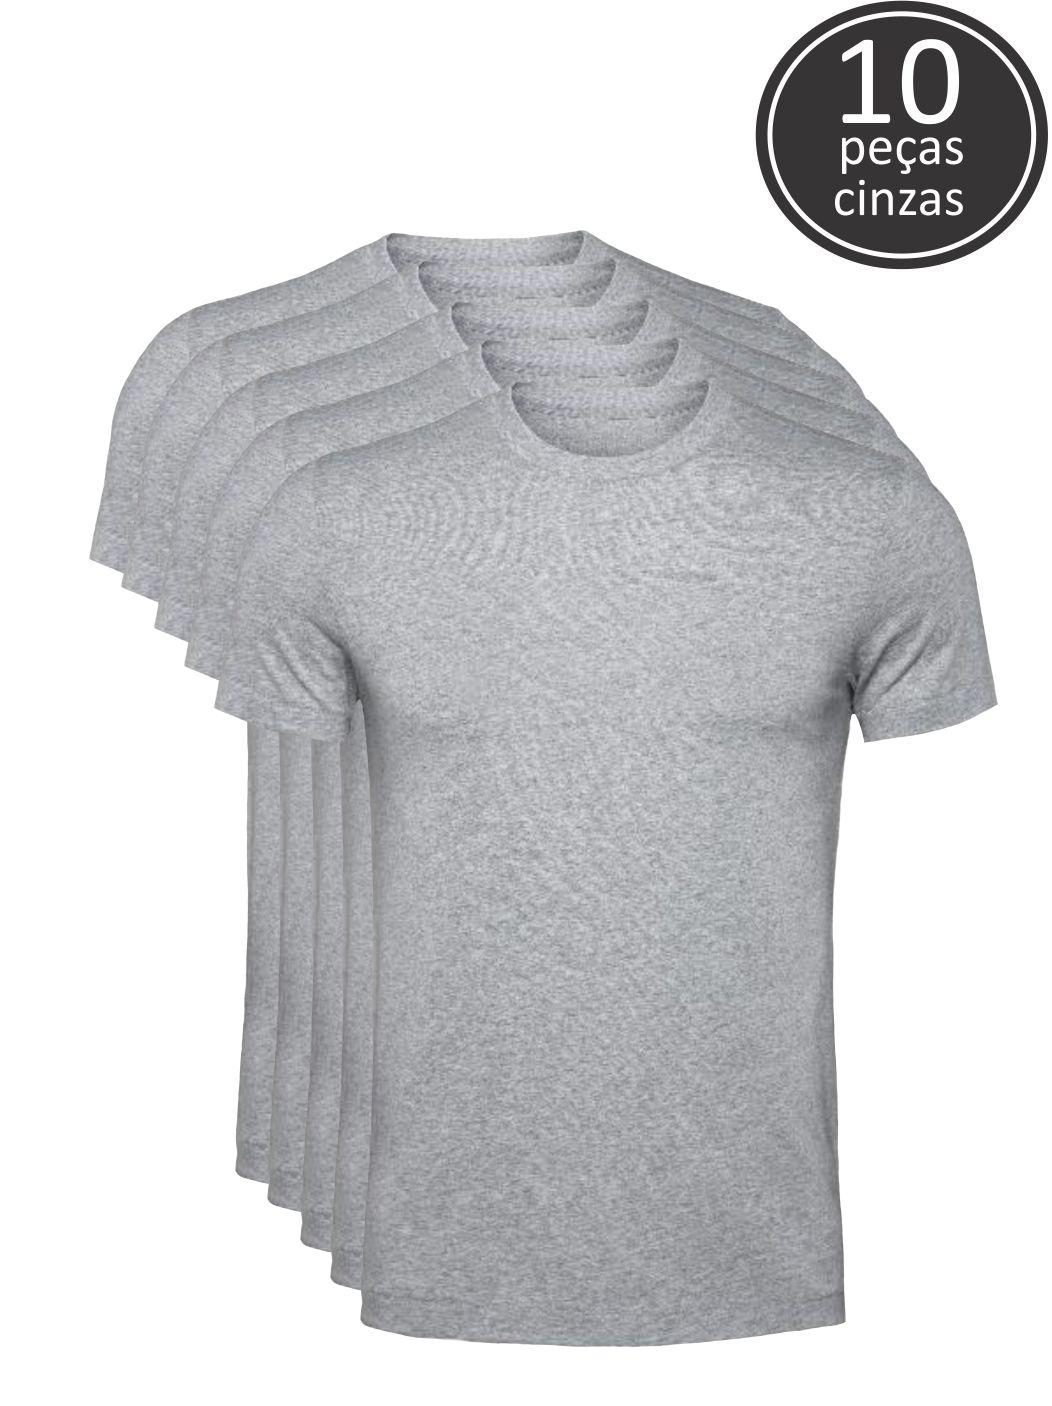 Kit 10 Camisetas Cinza Claro